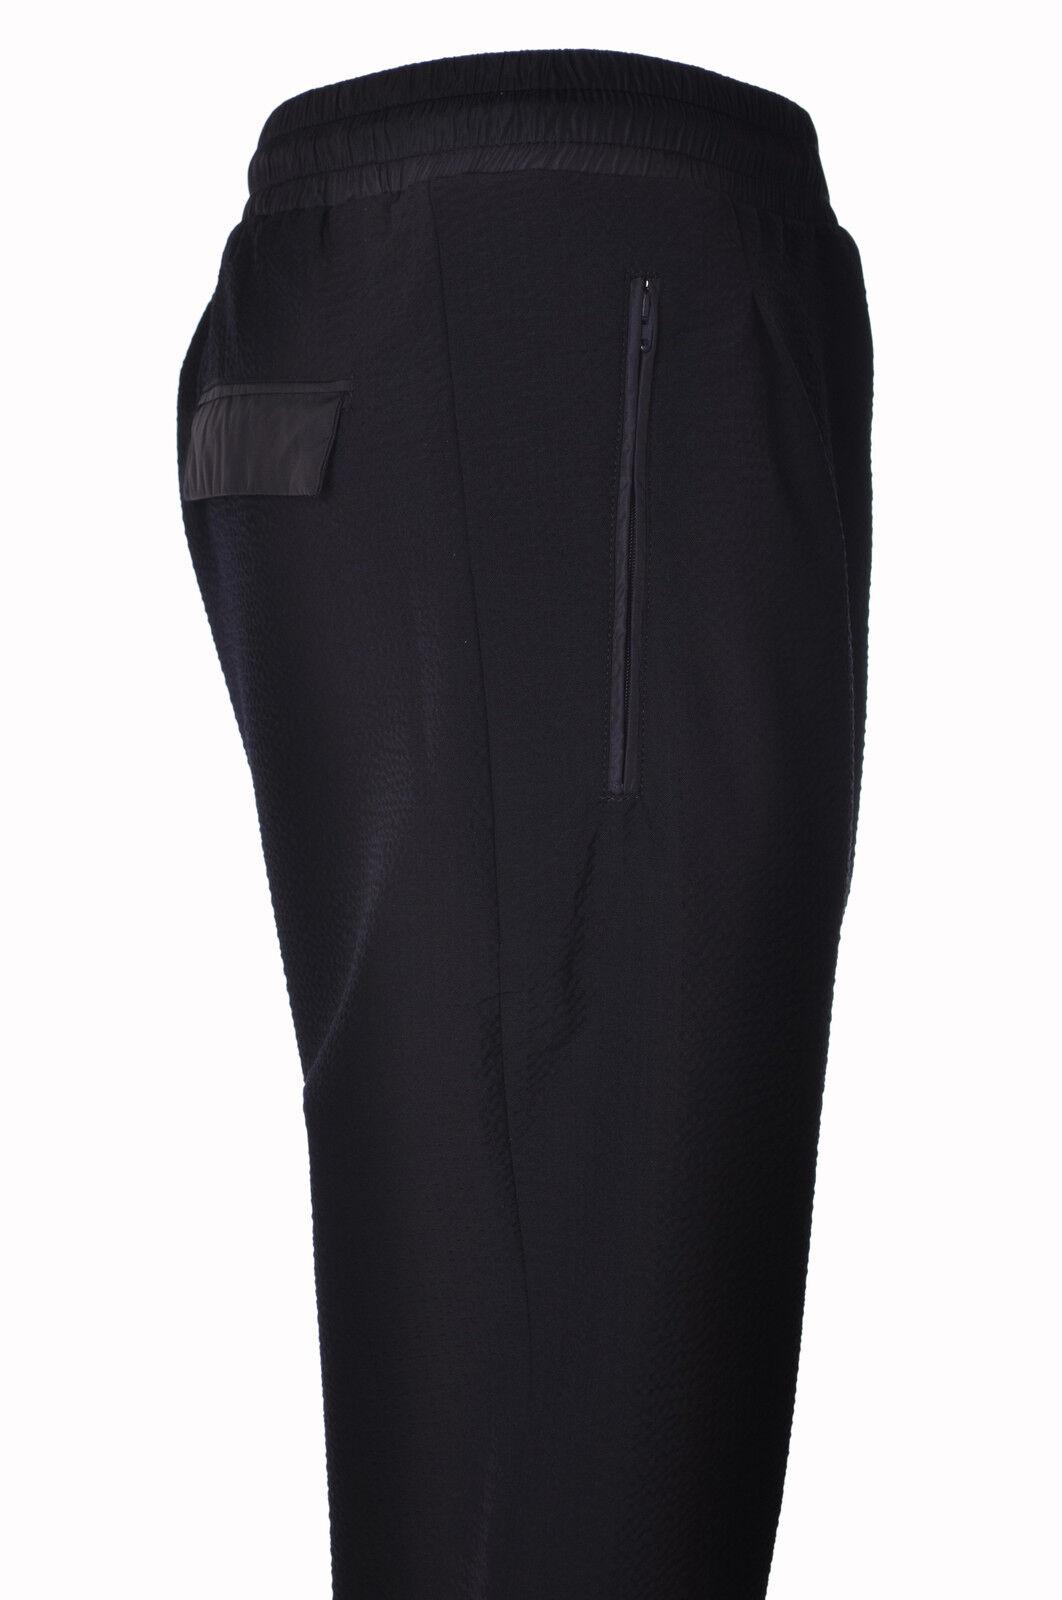 Low Brand  -  Pantalones cortos - Hombre - blue - 3613925A184452